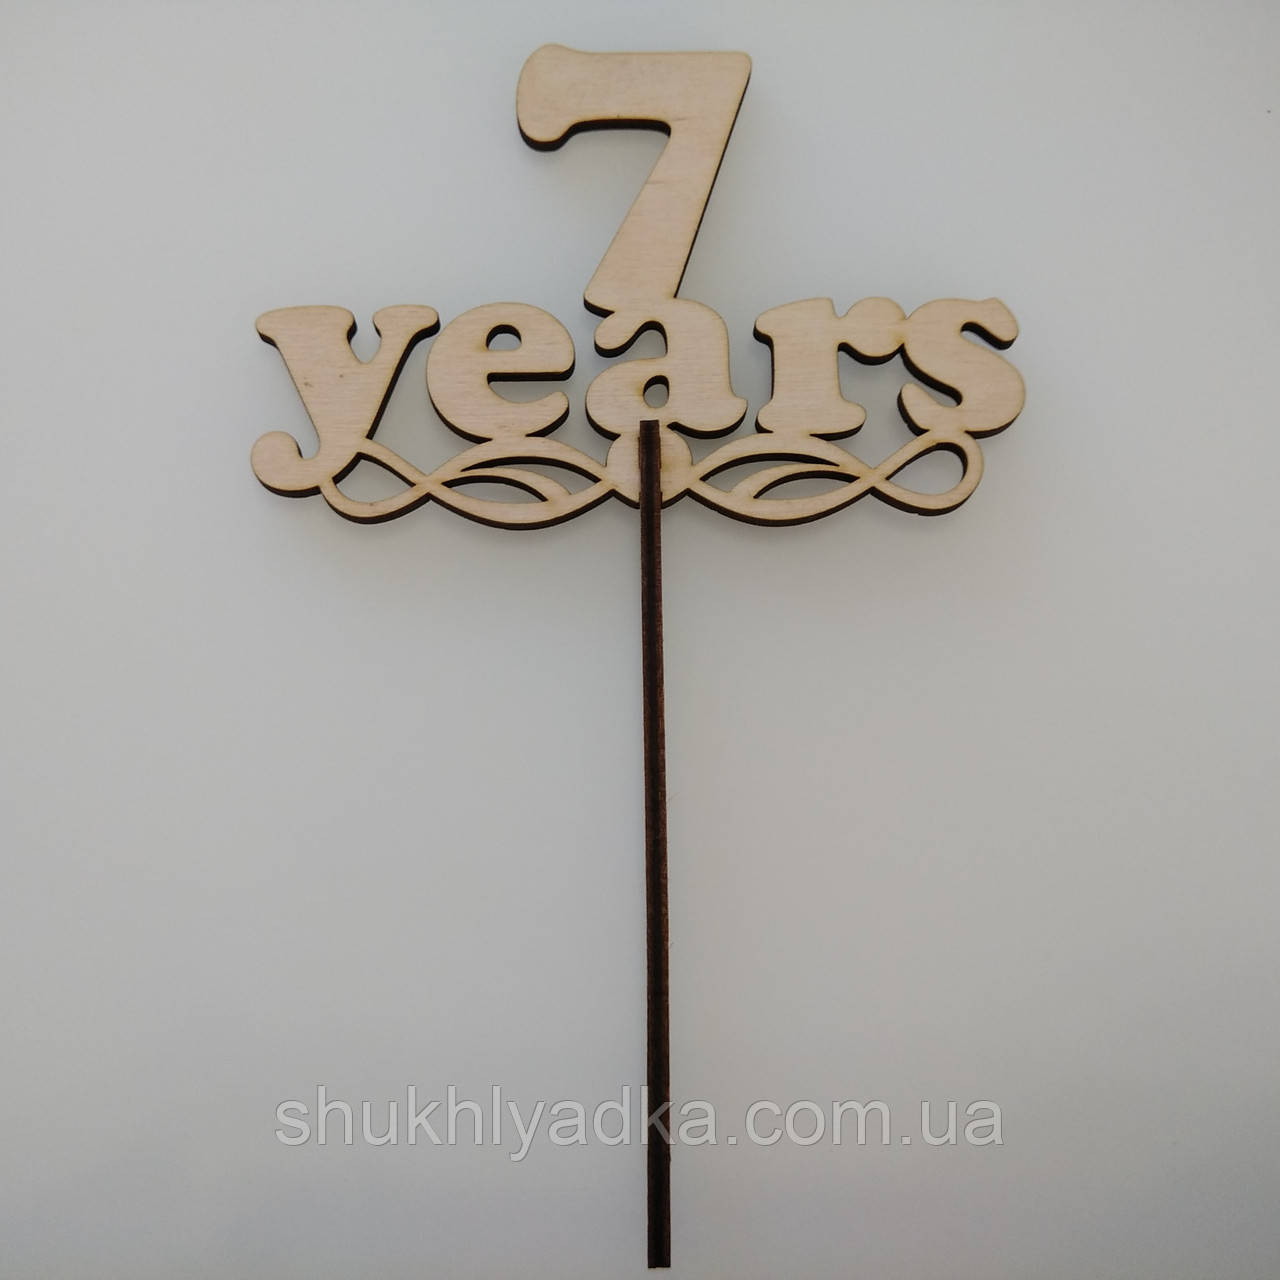 7years